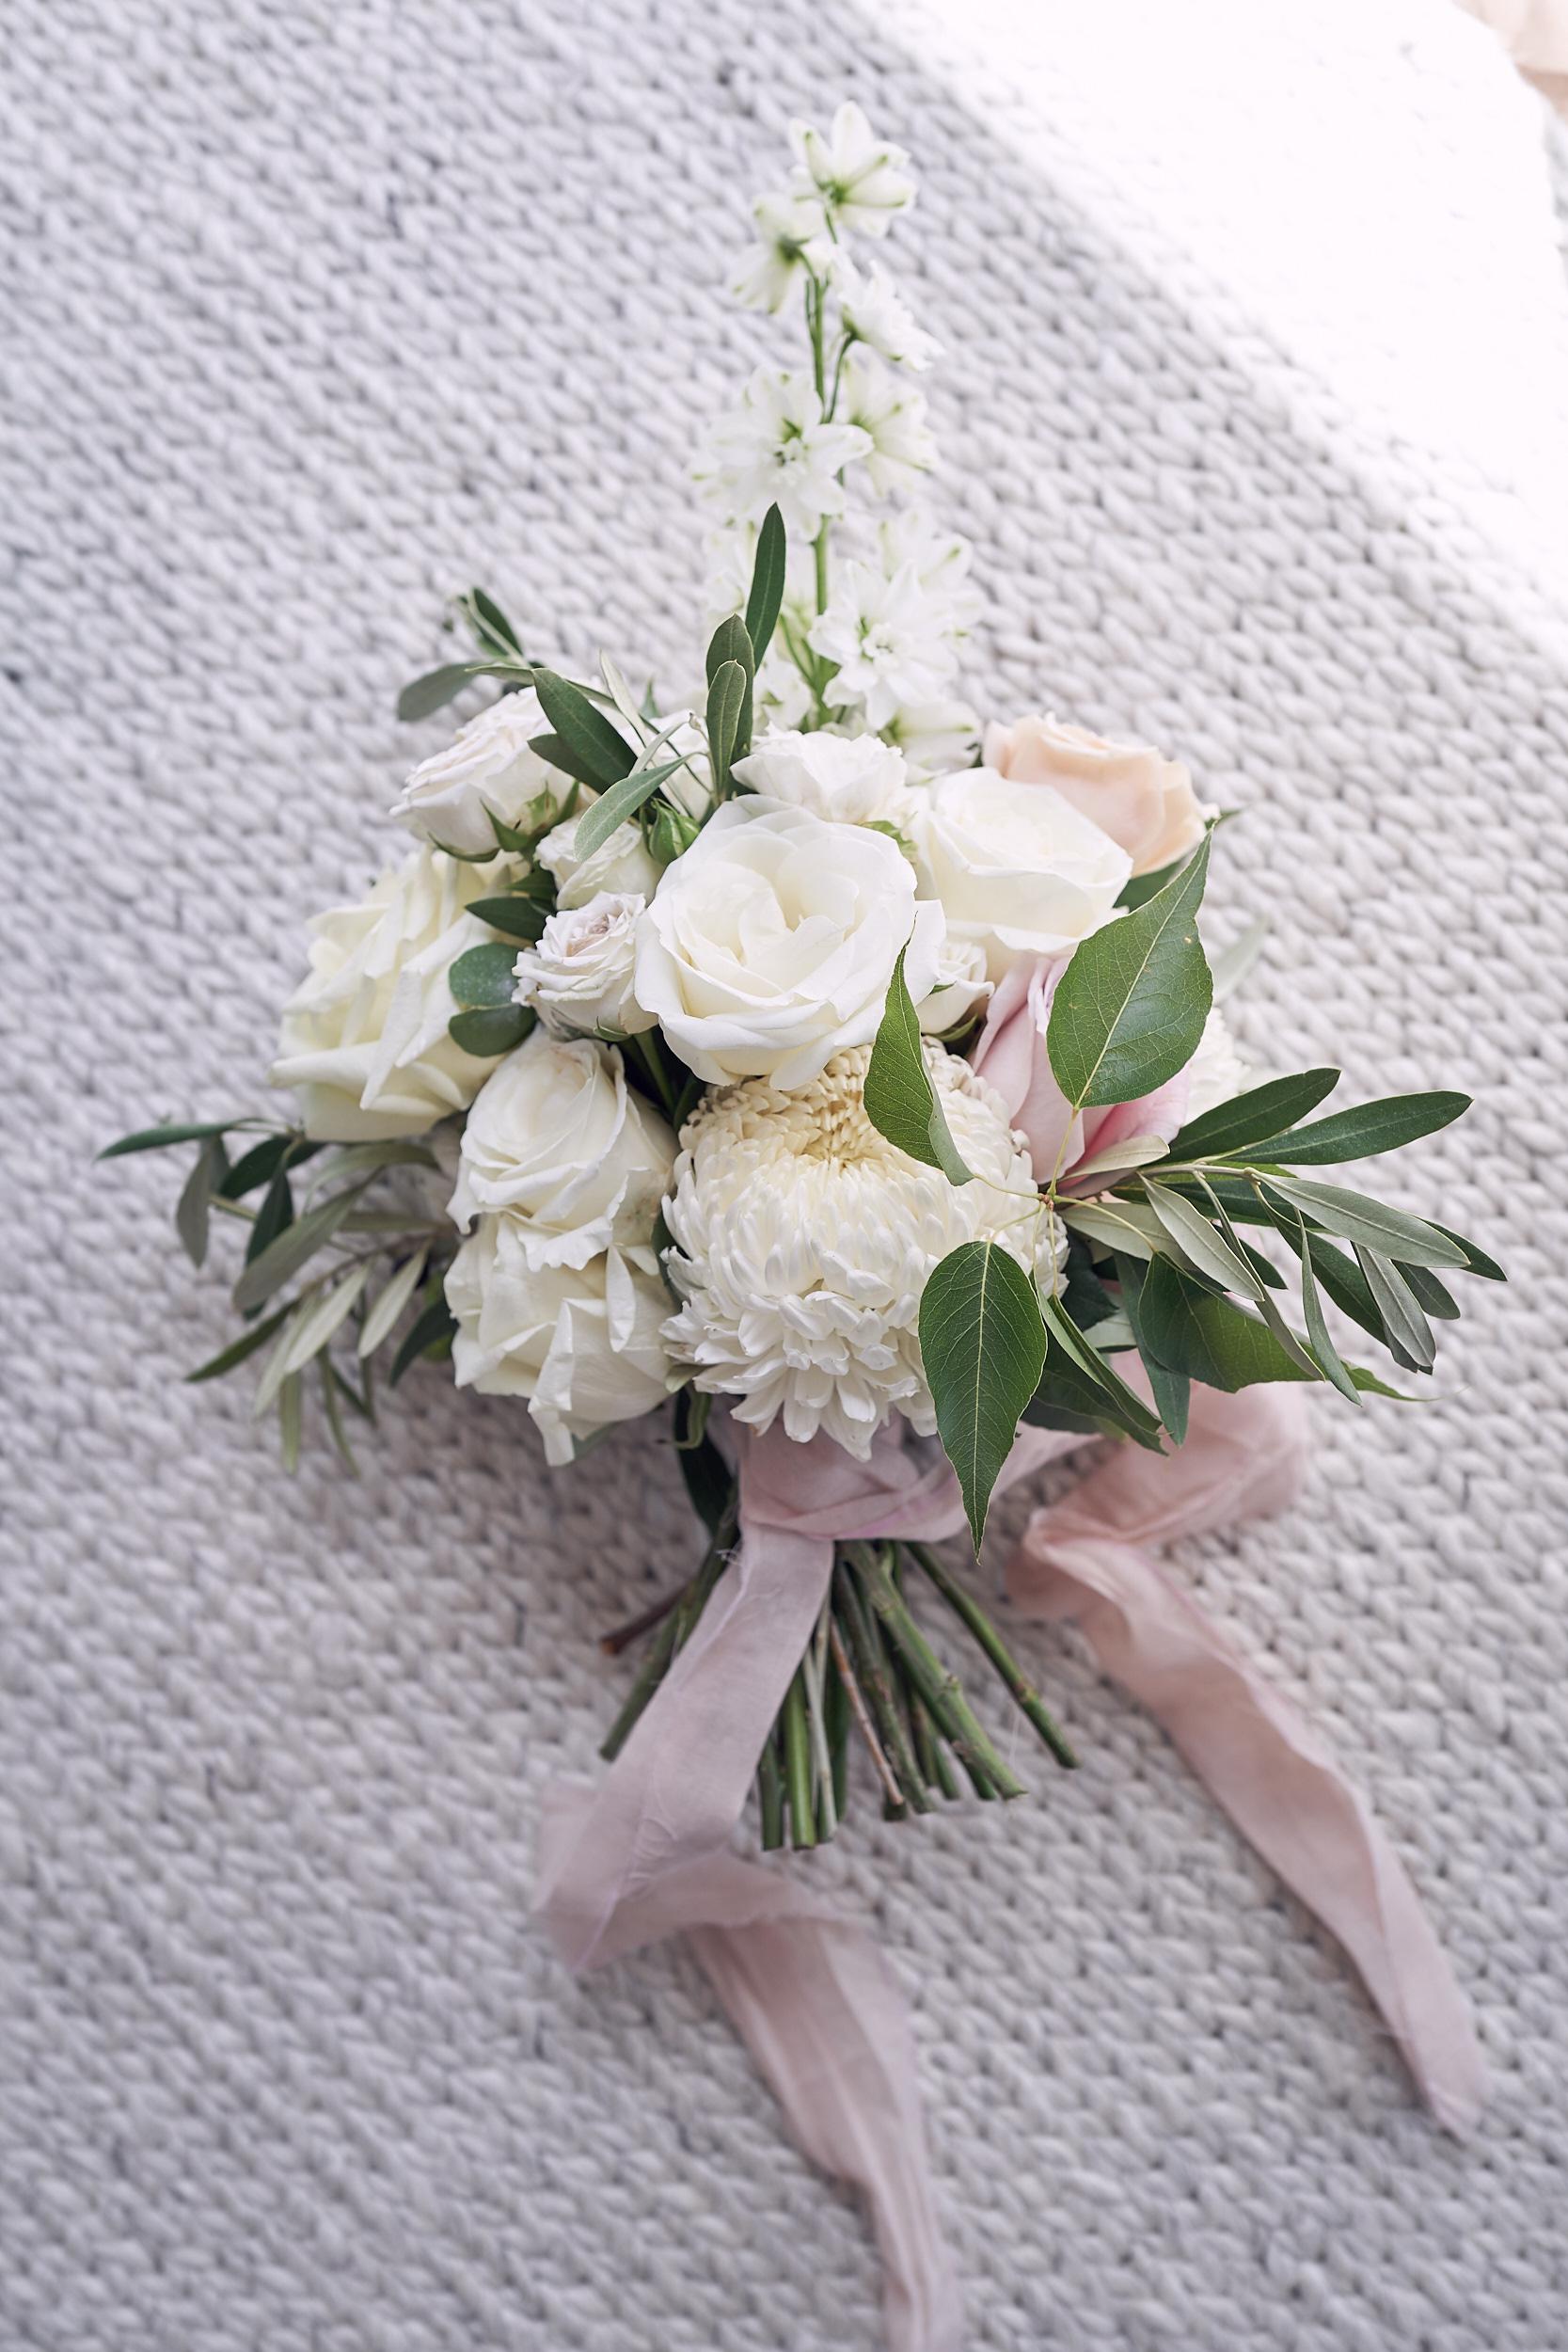 LR_JandA-aravina-wedding-LostInLove 141.jpg